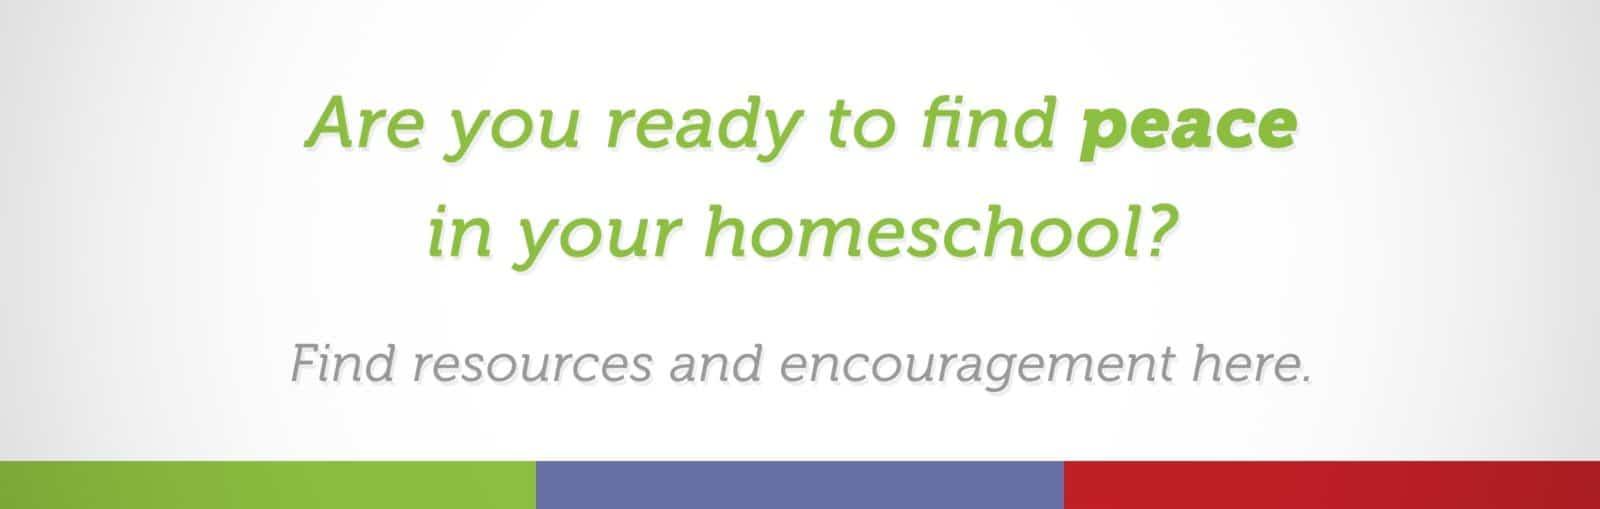 002_Homeschooling_Dyslexia_Banner_v3